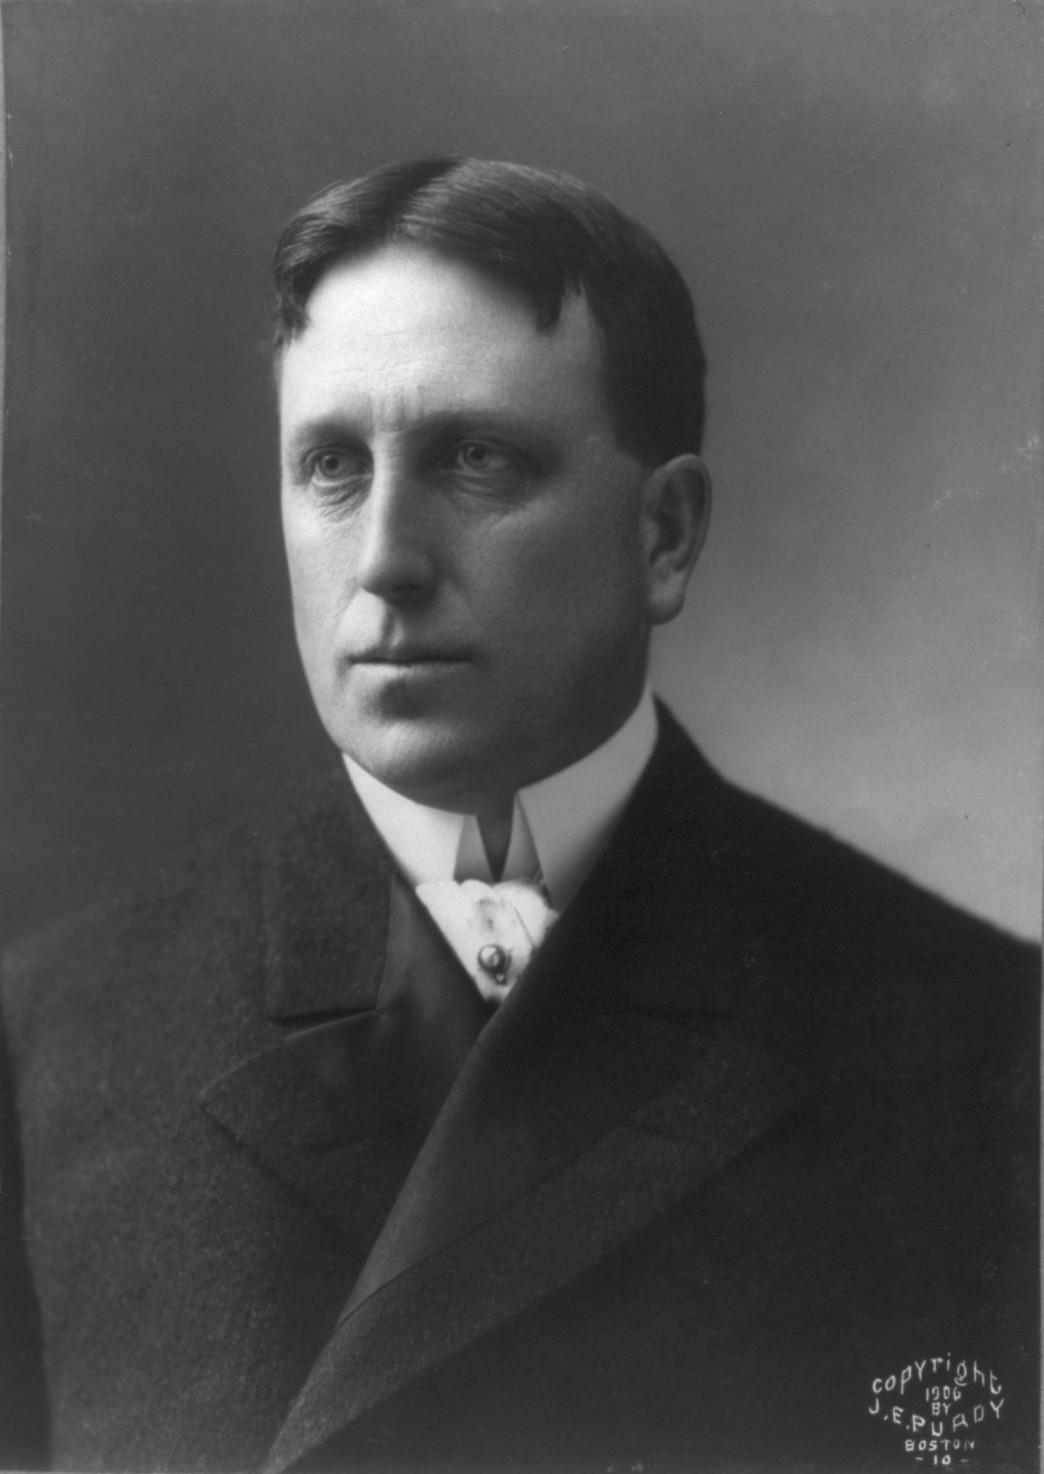 William Randolf Hearst